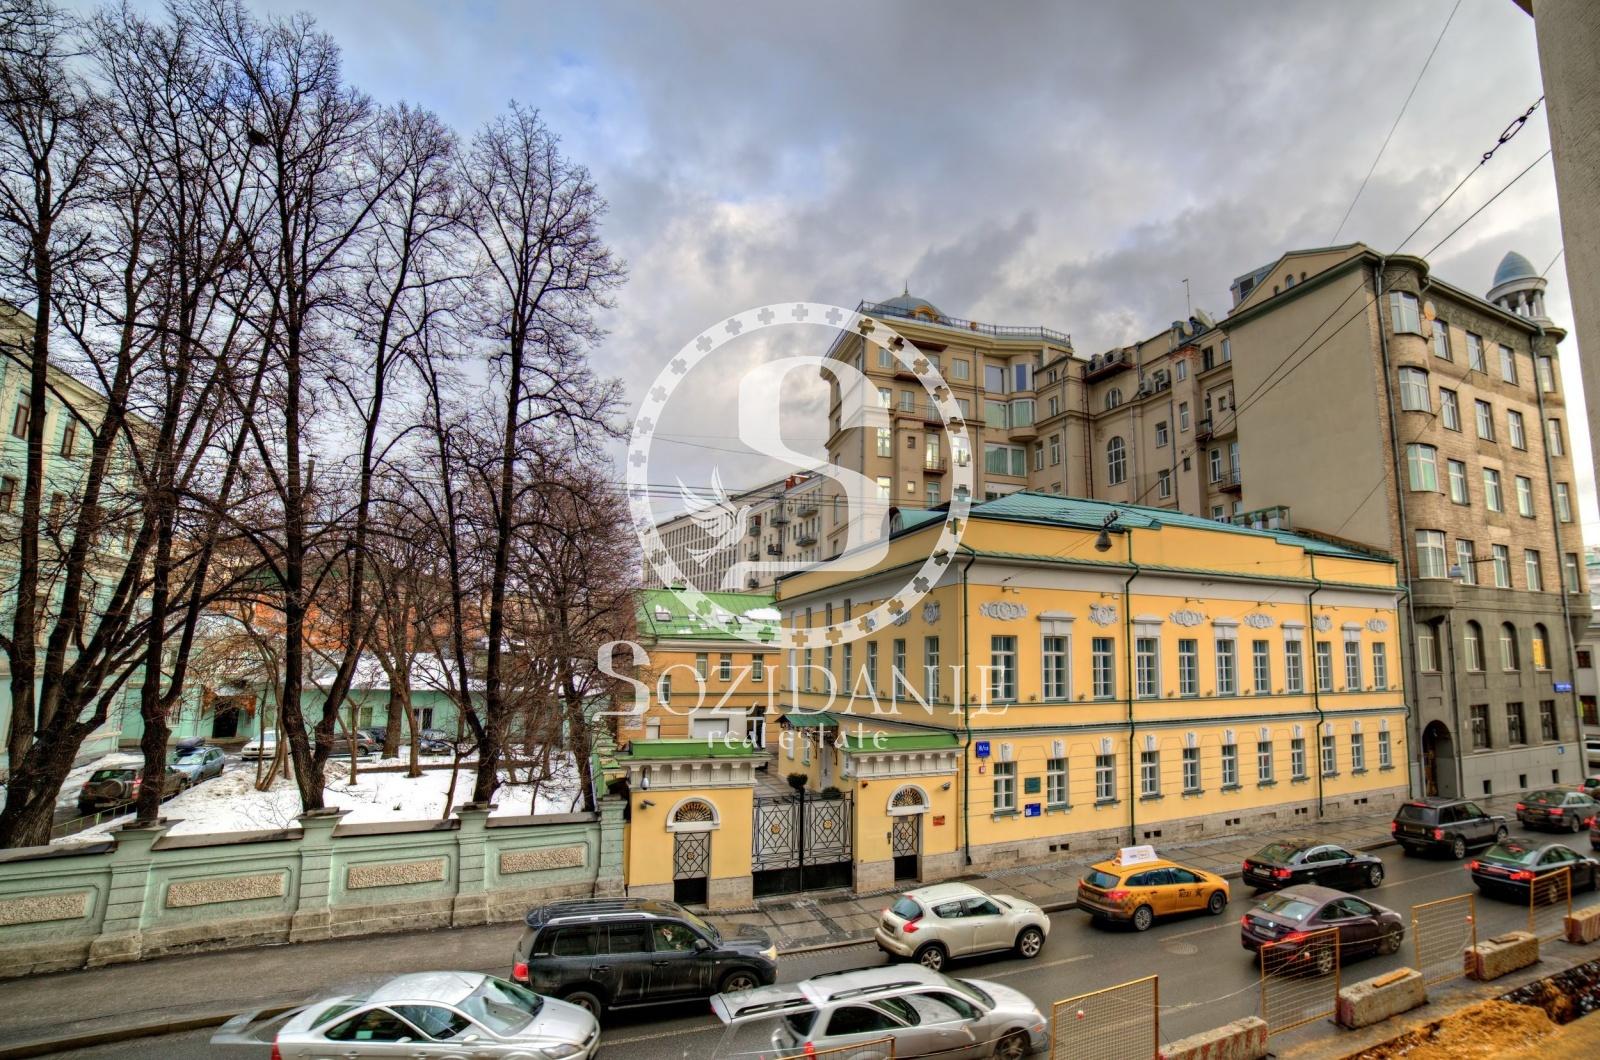 5 Комнаты, Городская, Аренда, Улица Знаменка, Listing ID 1506, Москва, Россия,